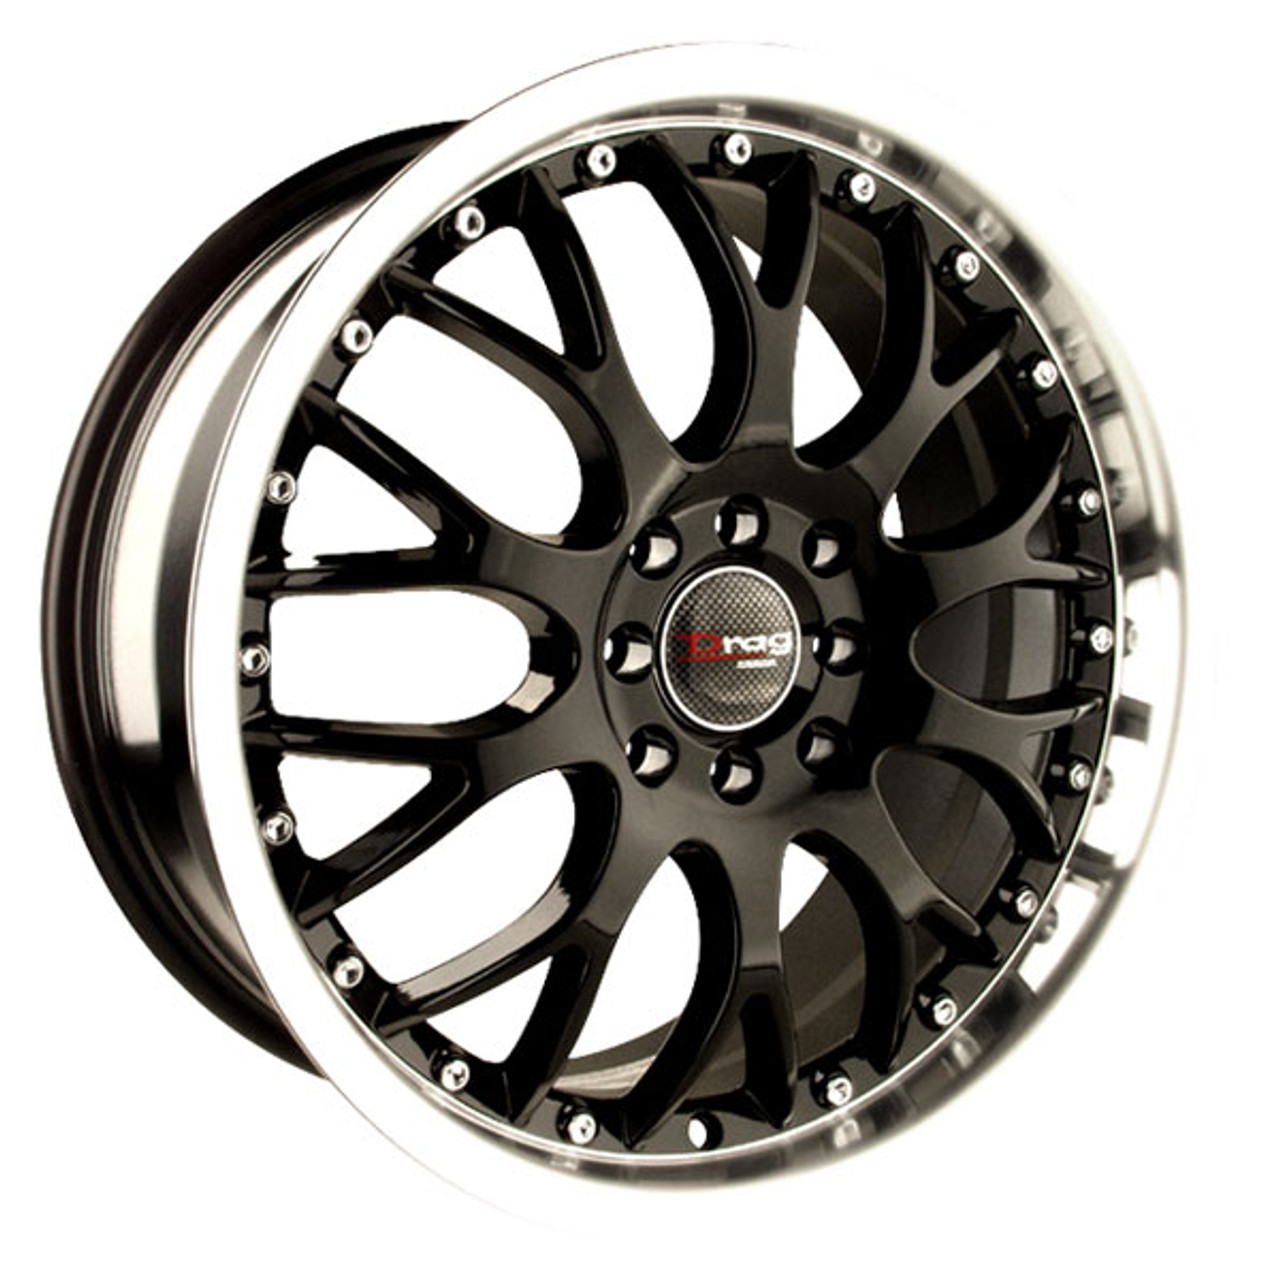 Free Shipping On Drag DR60 60x60 Et60 Cb603 60x1060 60x60 Gloss Black Impressive 5x105 Bolt Pattern